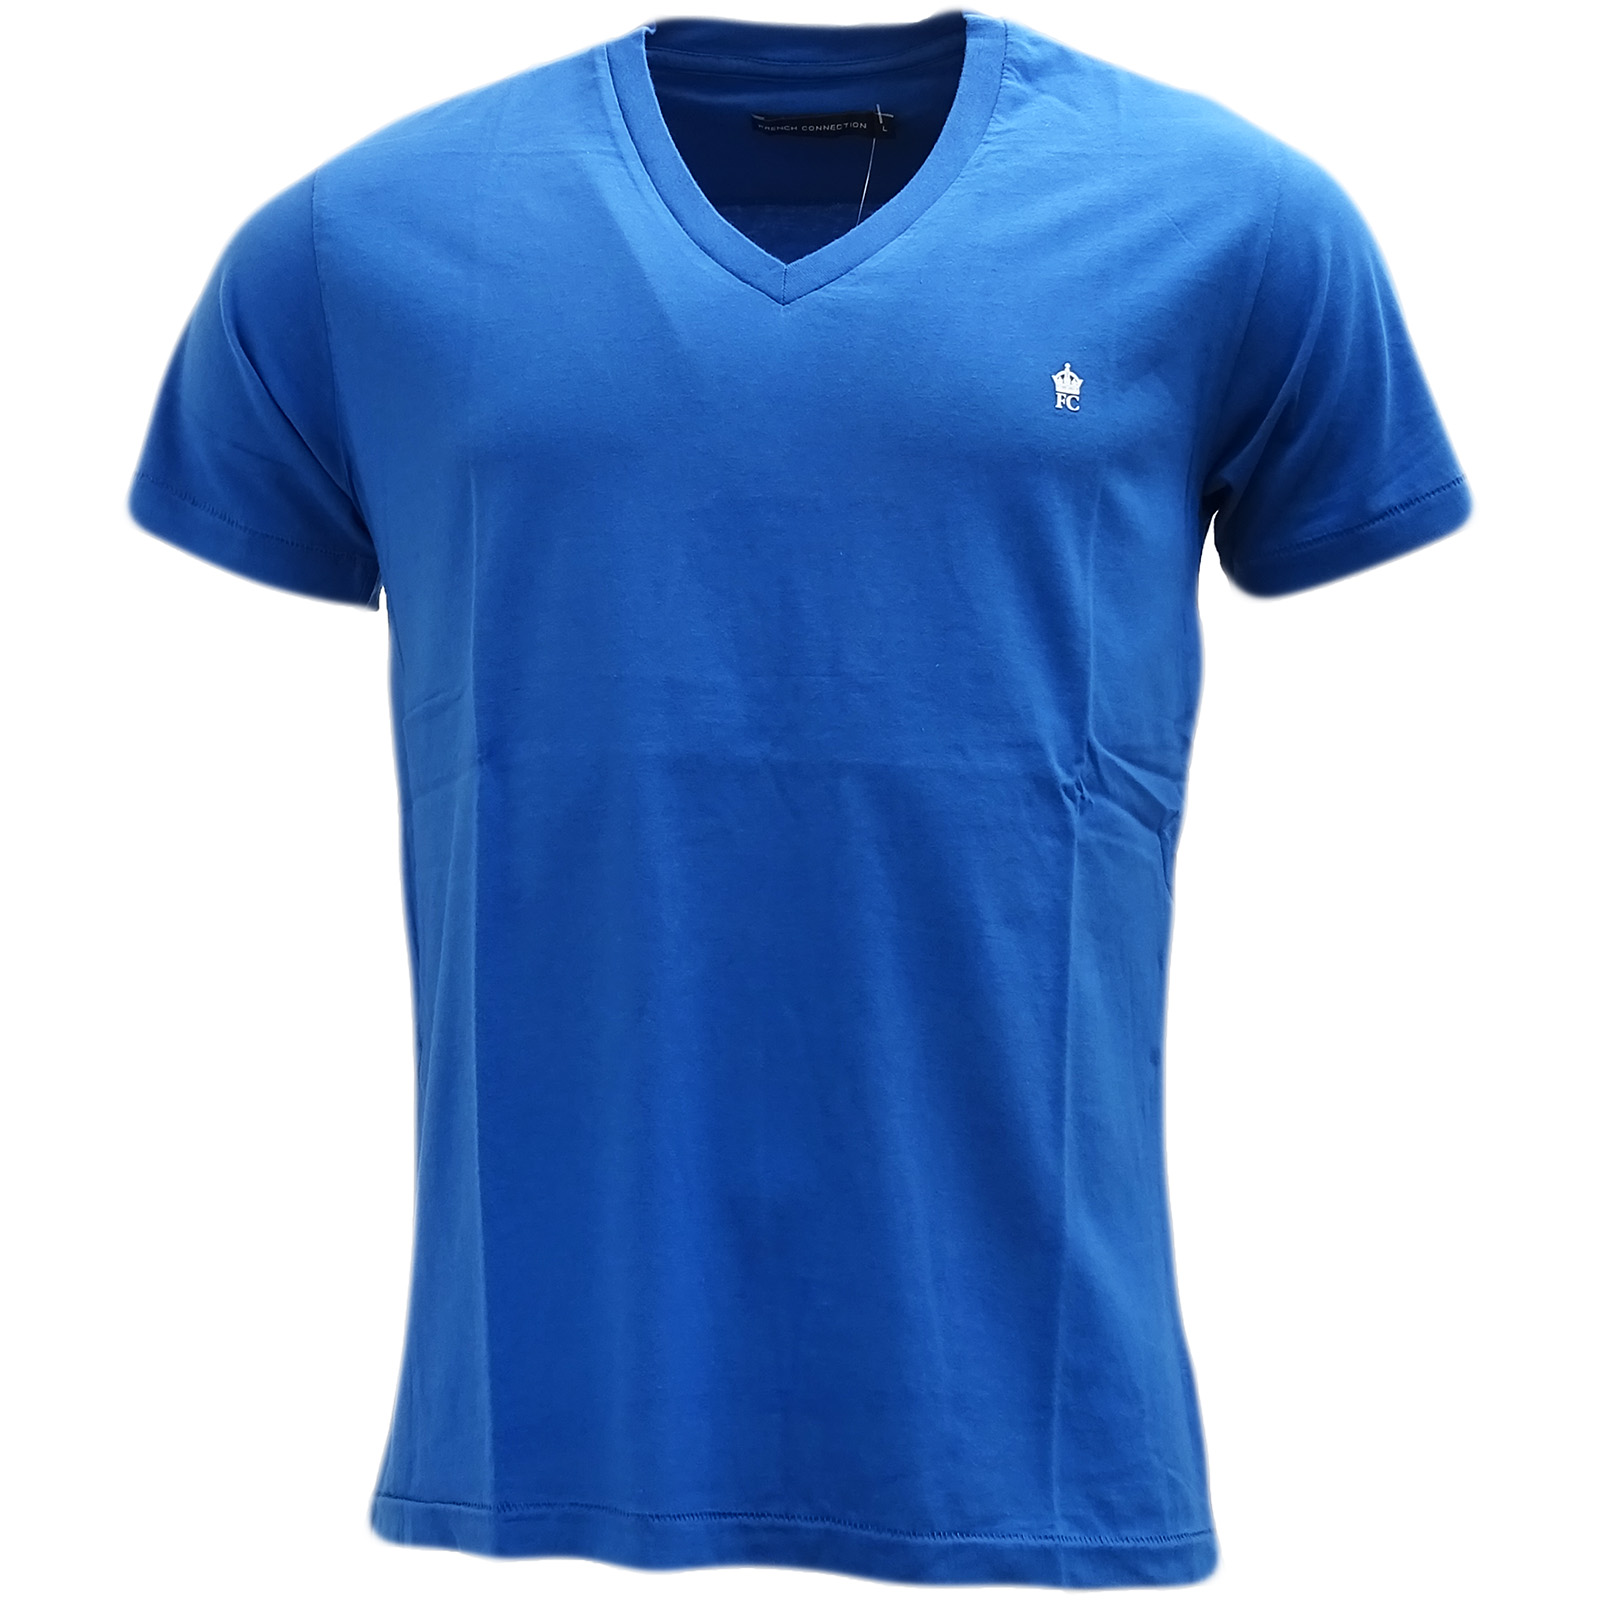 French Connection Blue Plain V Neck T-Shirt 56Izg -